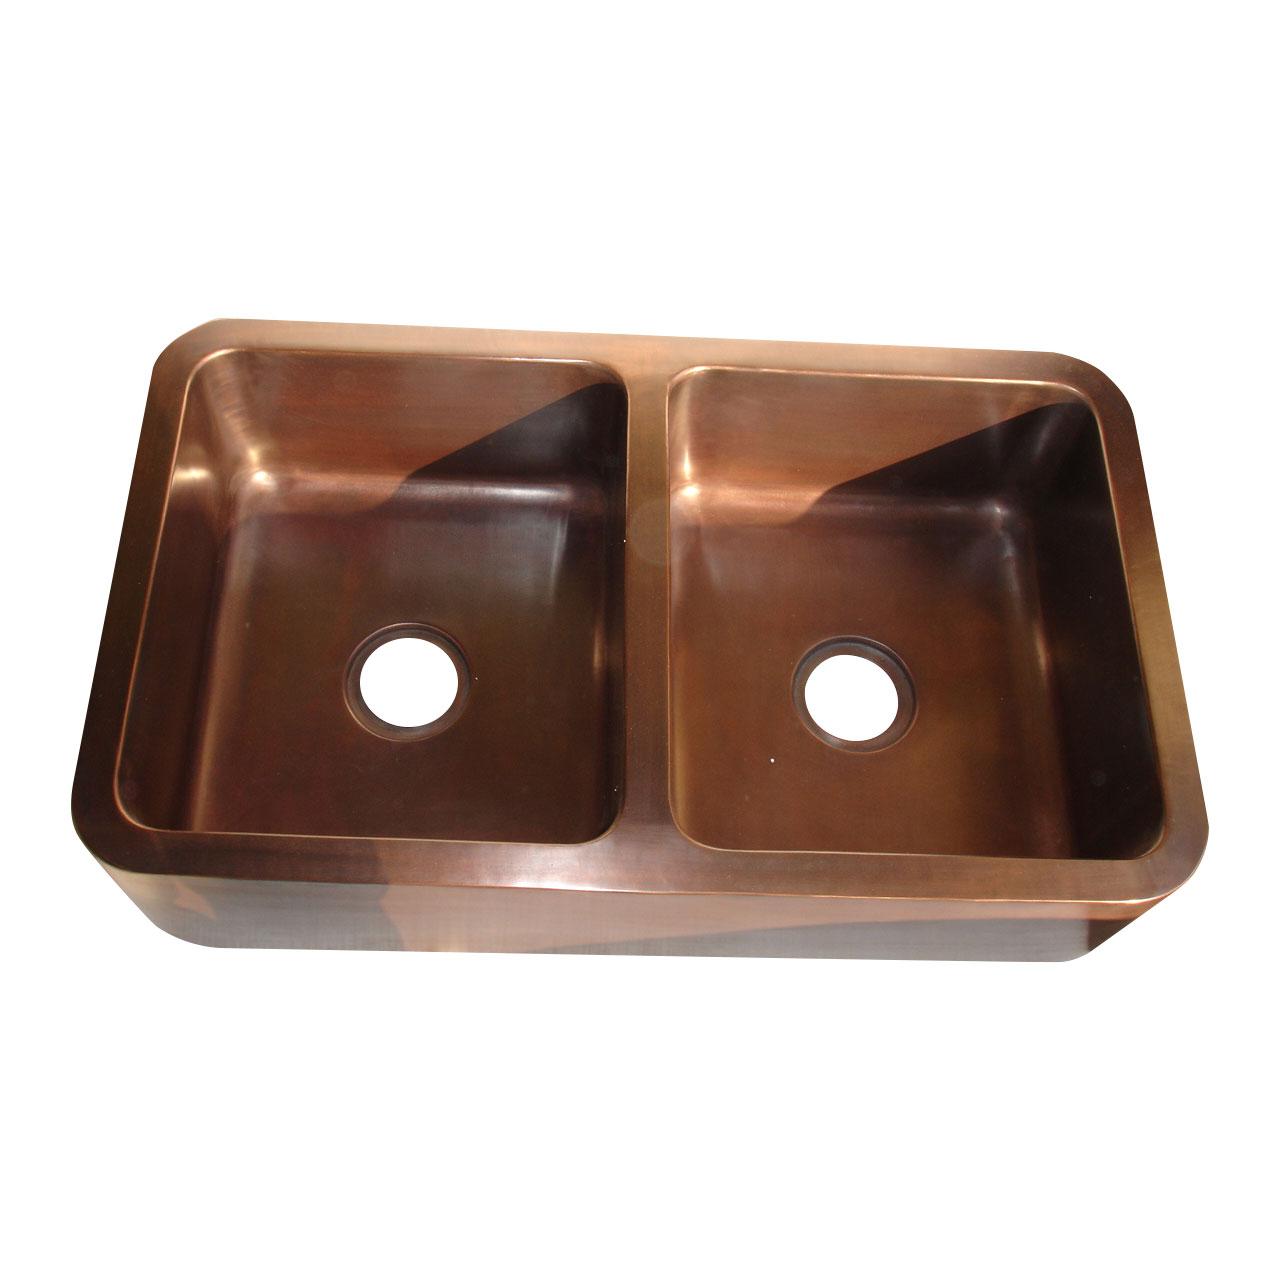 Rectangular Double Bowl Copper Kitchen Sink Coppersmith